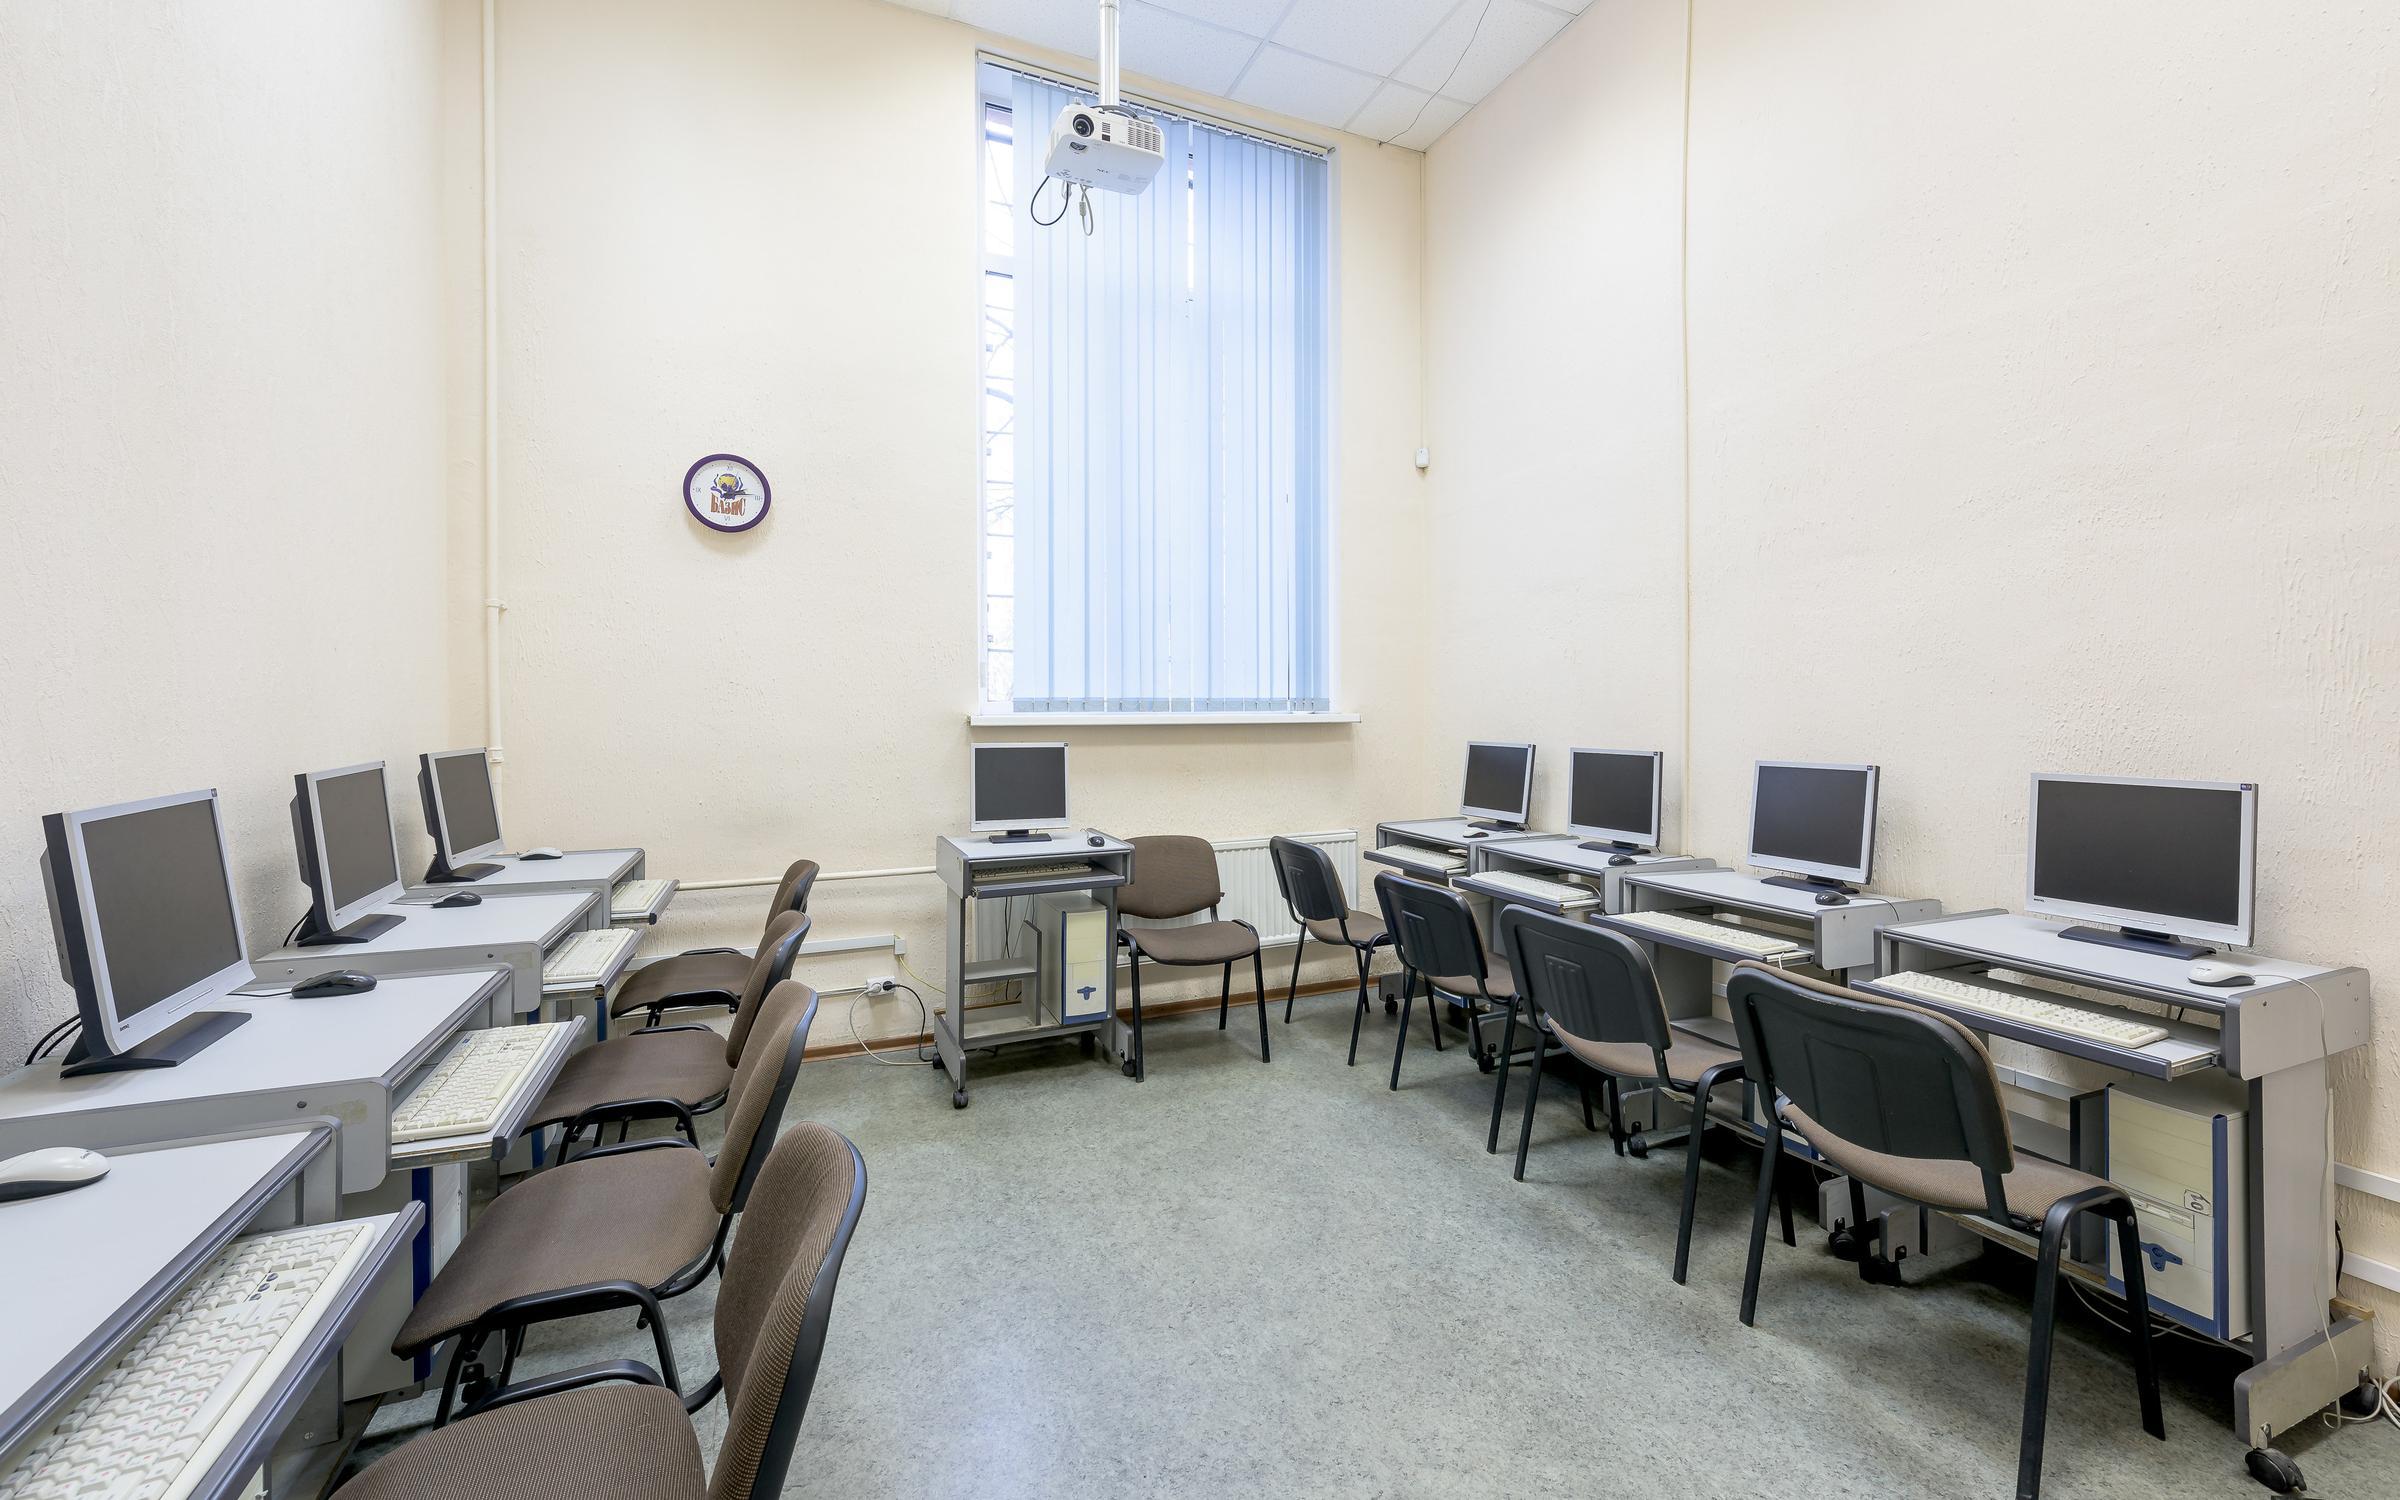 фотография Учебного центра Базис на проспекте Юрия Гагарина